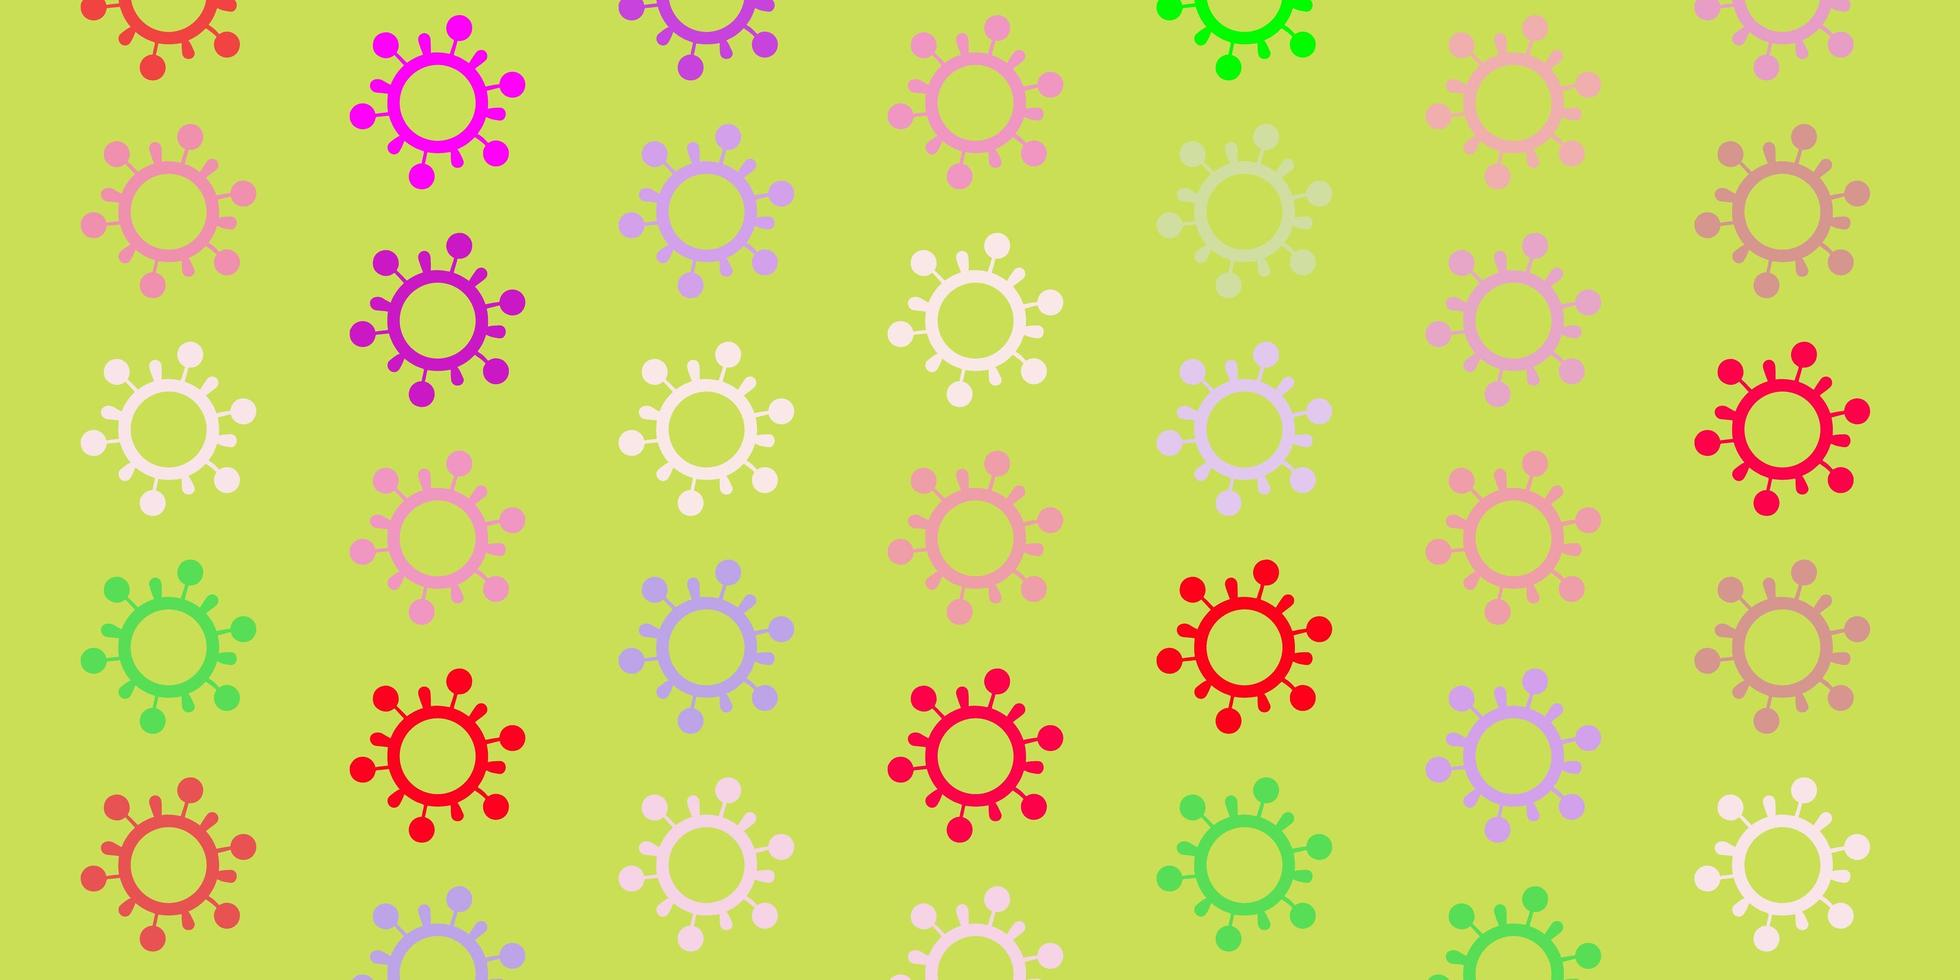 patrón de vector rosa claro, verde con elementos de coronavirus.